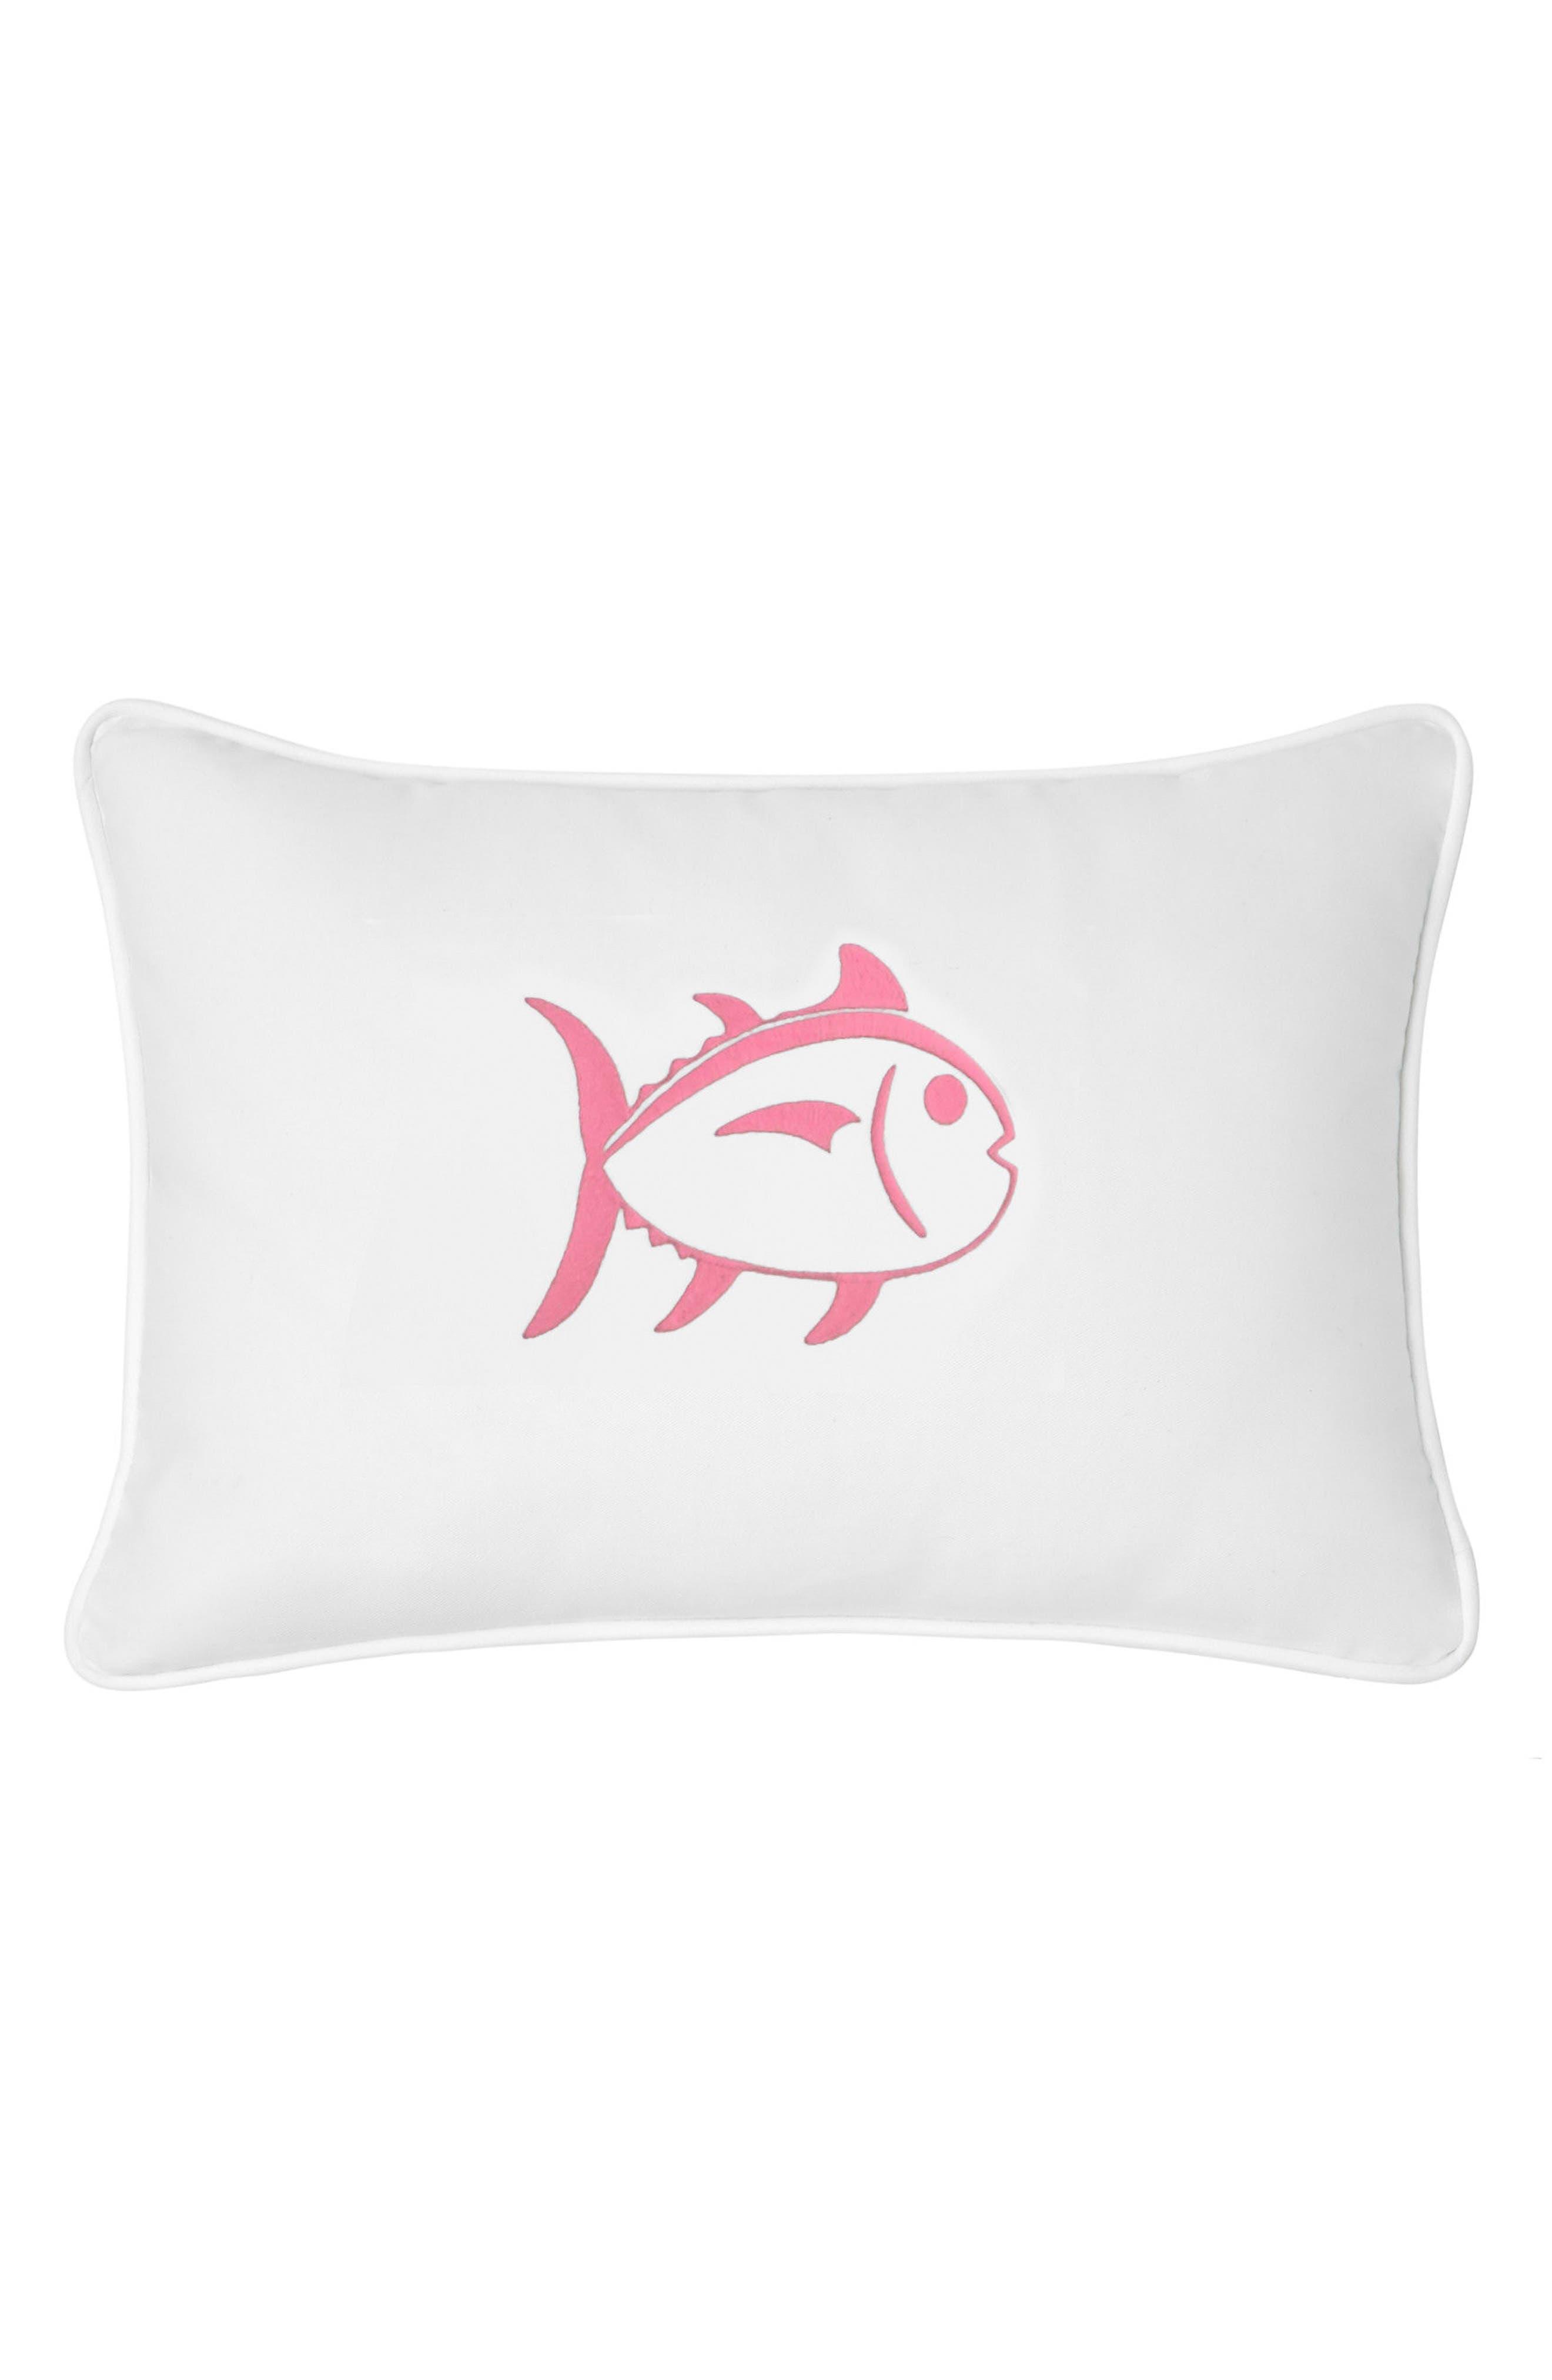 Skipjack Fish Accent Pillow,                             Main thumbnail 1, color,                             020